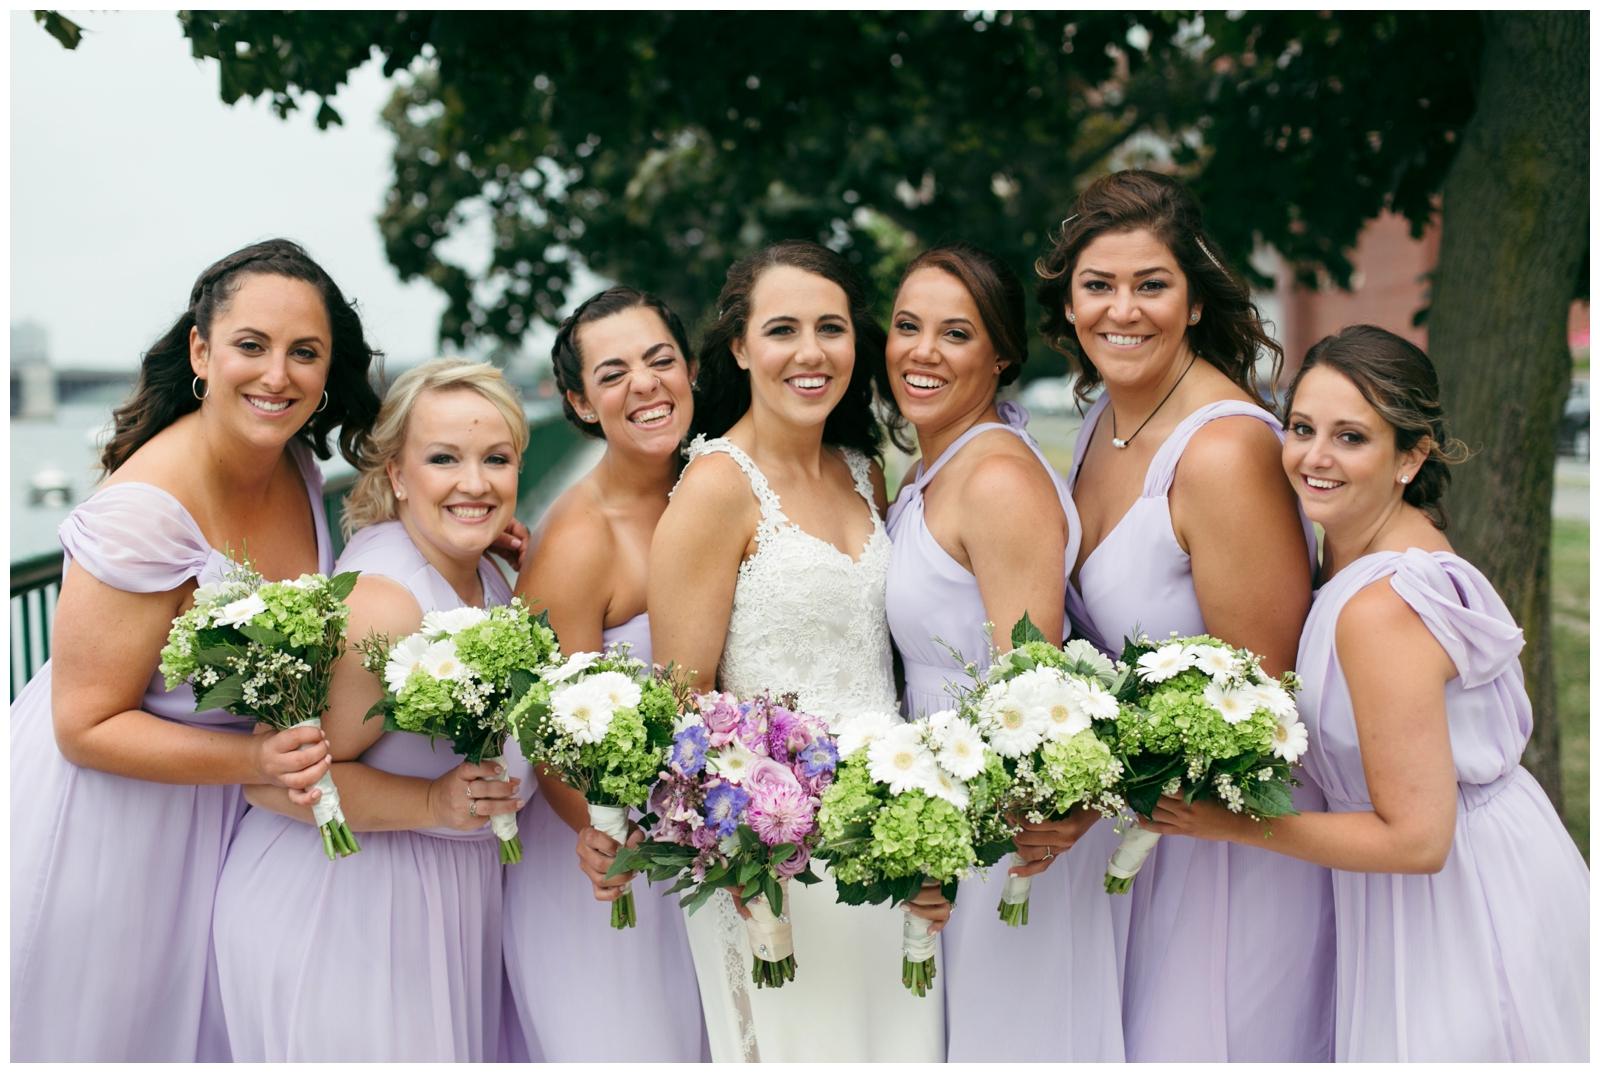 Bailey-Q-Photo-Royal-Sonesta-Boston-Wedding-Photographer-029.jpg